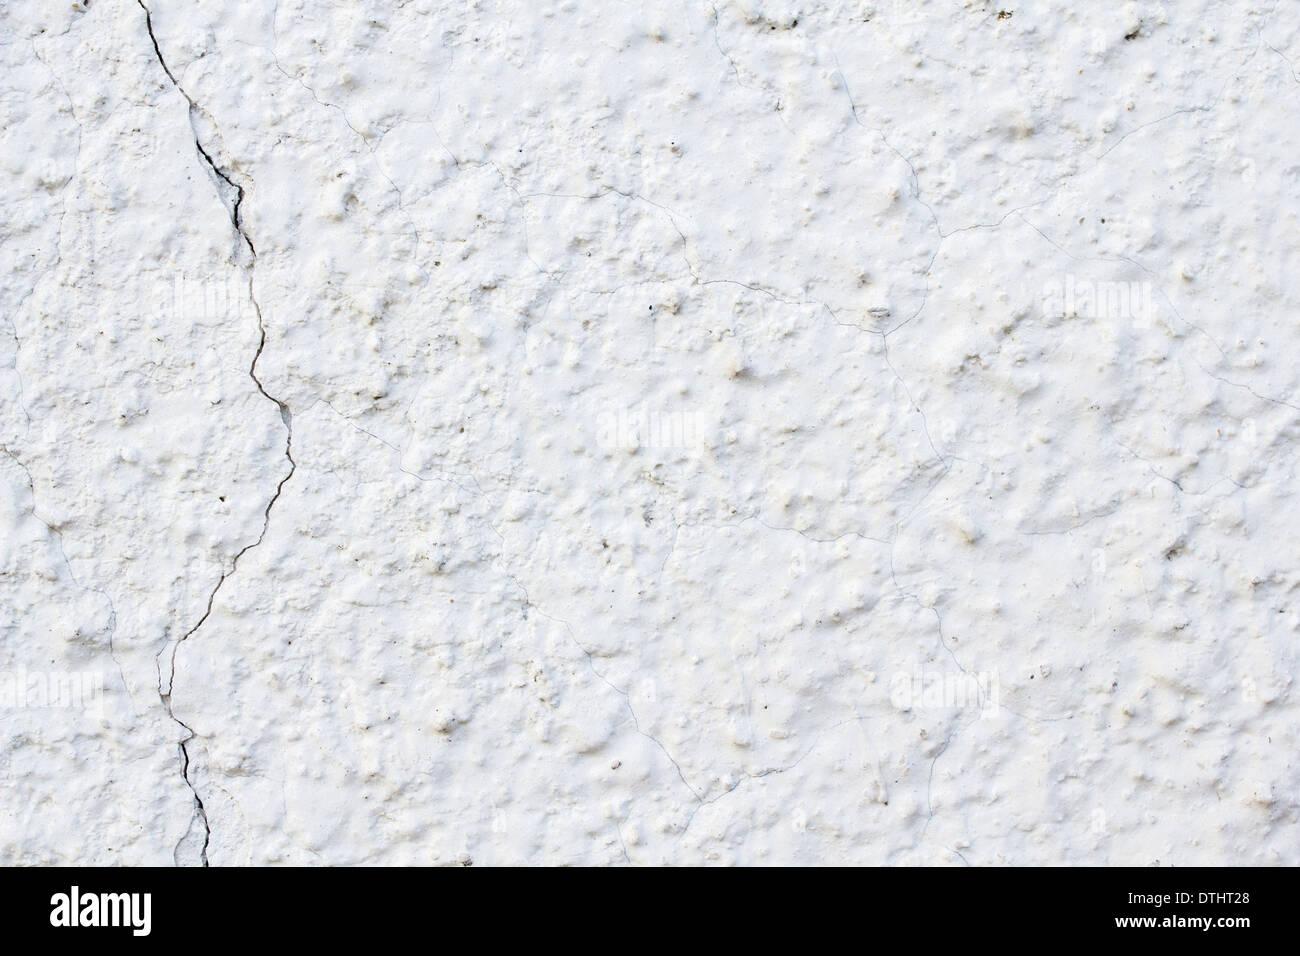 cracked wall background stock photo 66774912 alamy